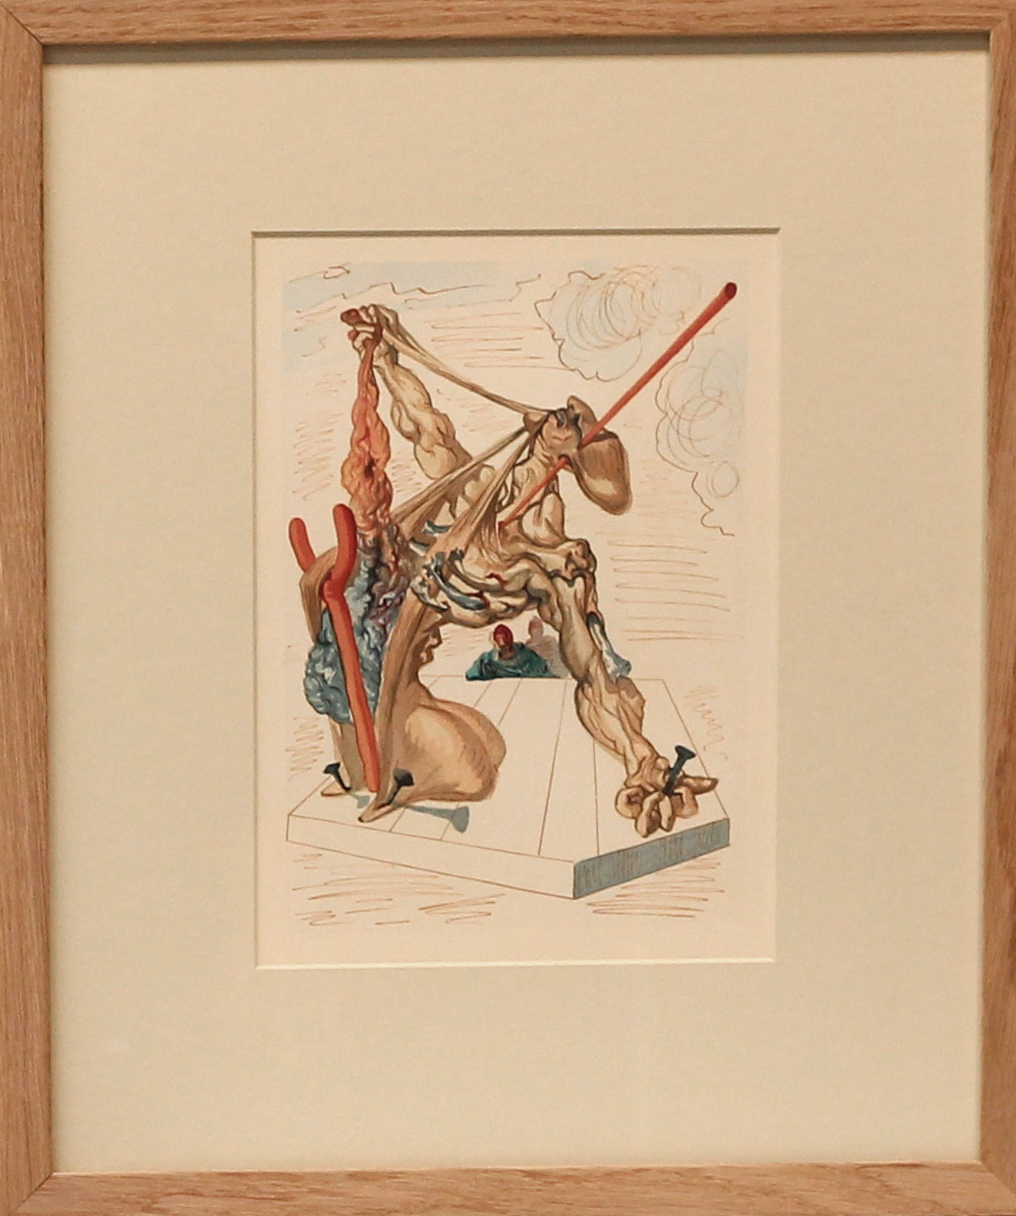 Salvador Dalí print